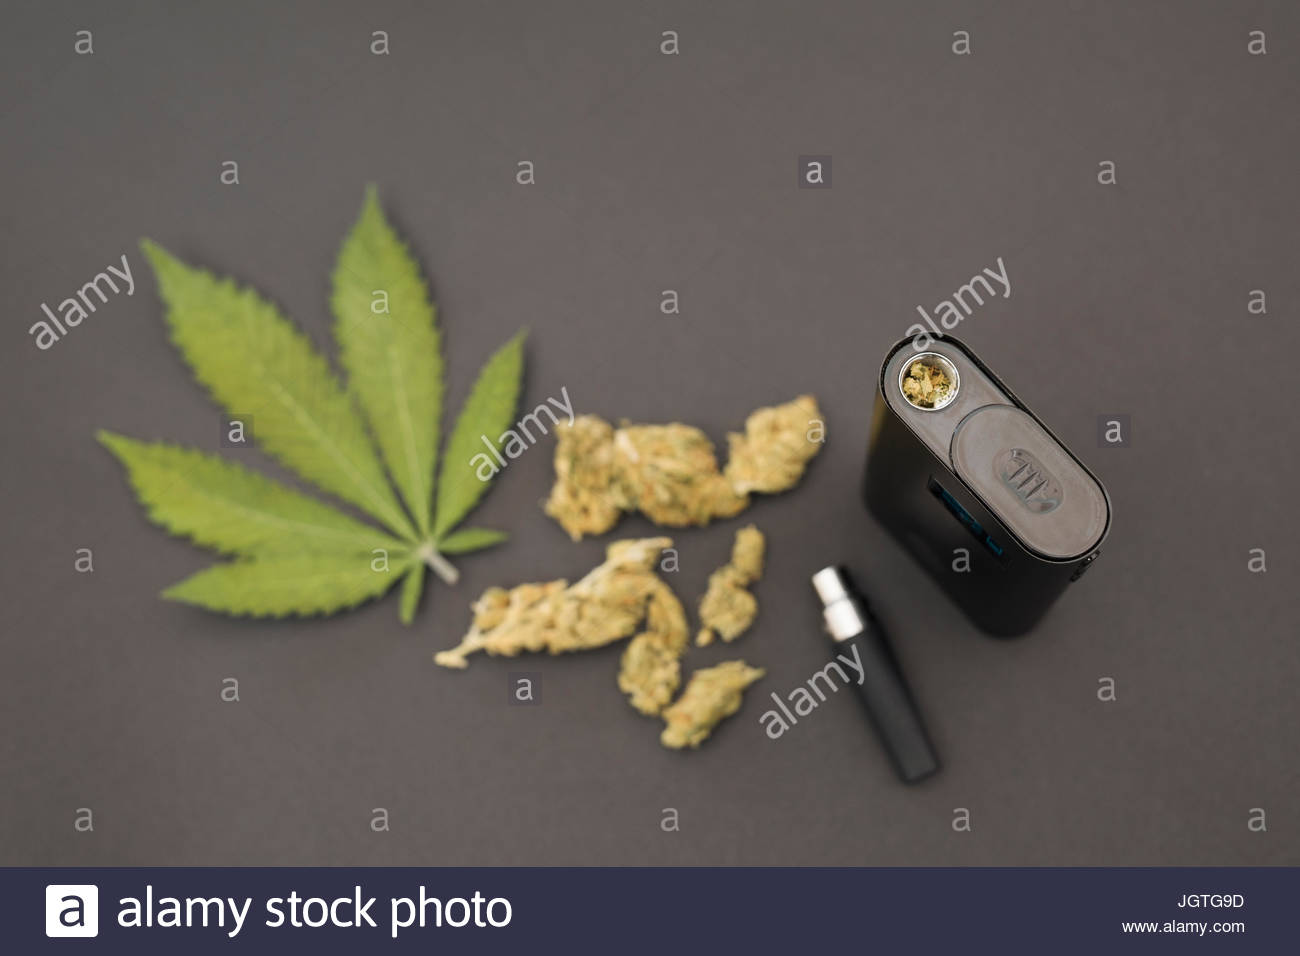 Knolling of marijuana leaves, buds and vaporizer - Stock Image